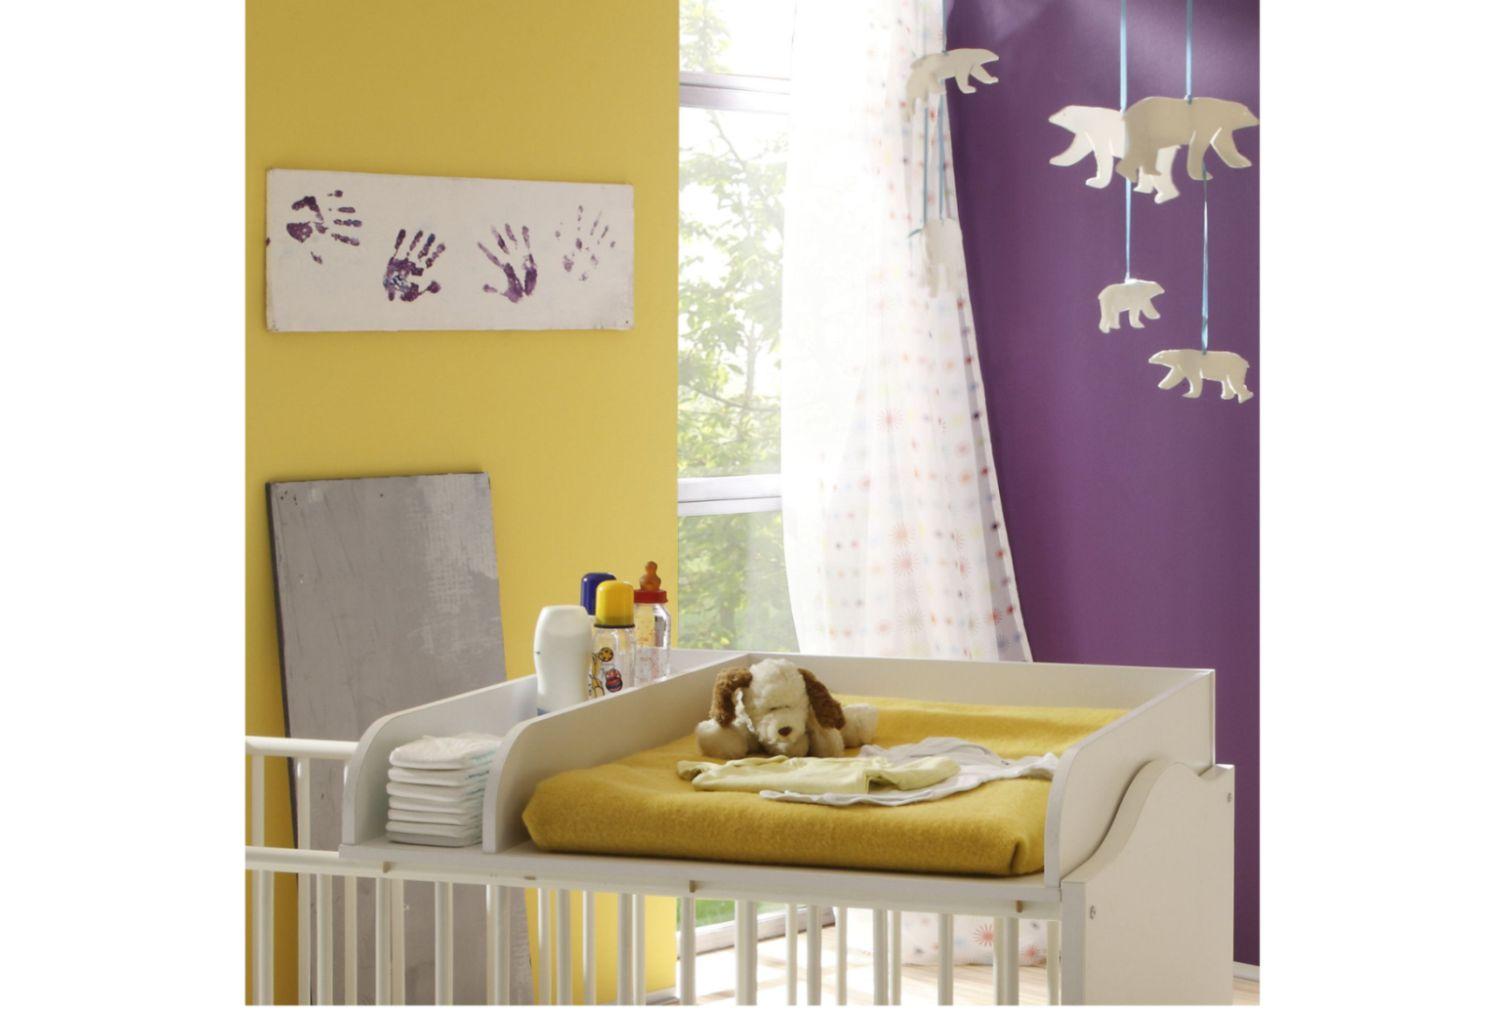 wickelplatte wickeltisch wickelauflage wickelbrett. Black Bedroom Furniture Sets. Home Design Ideas